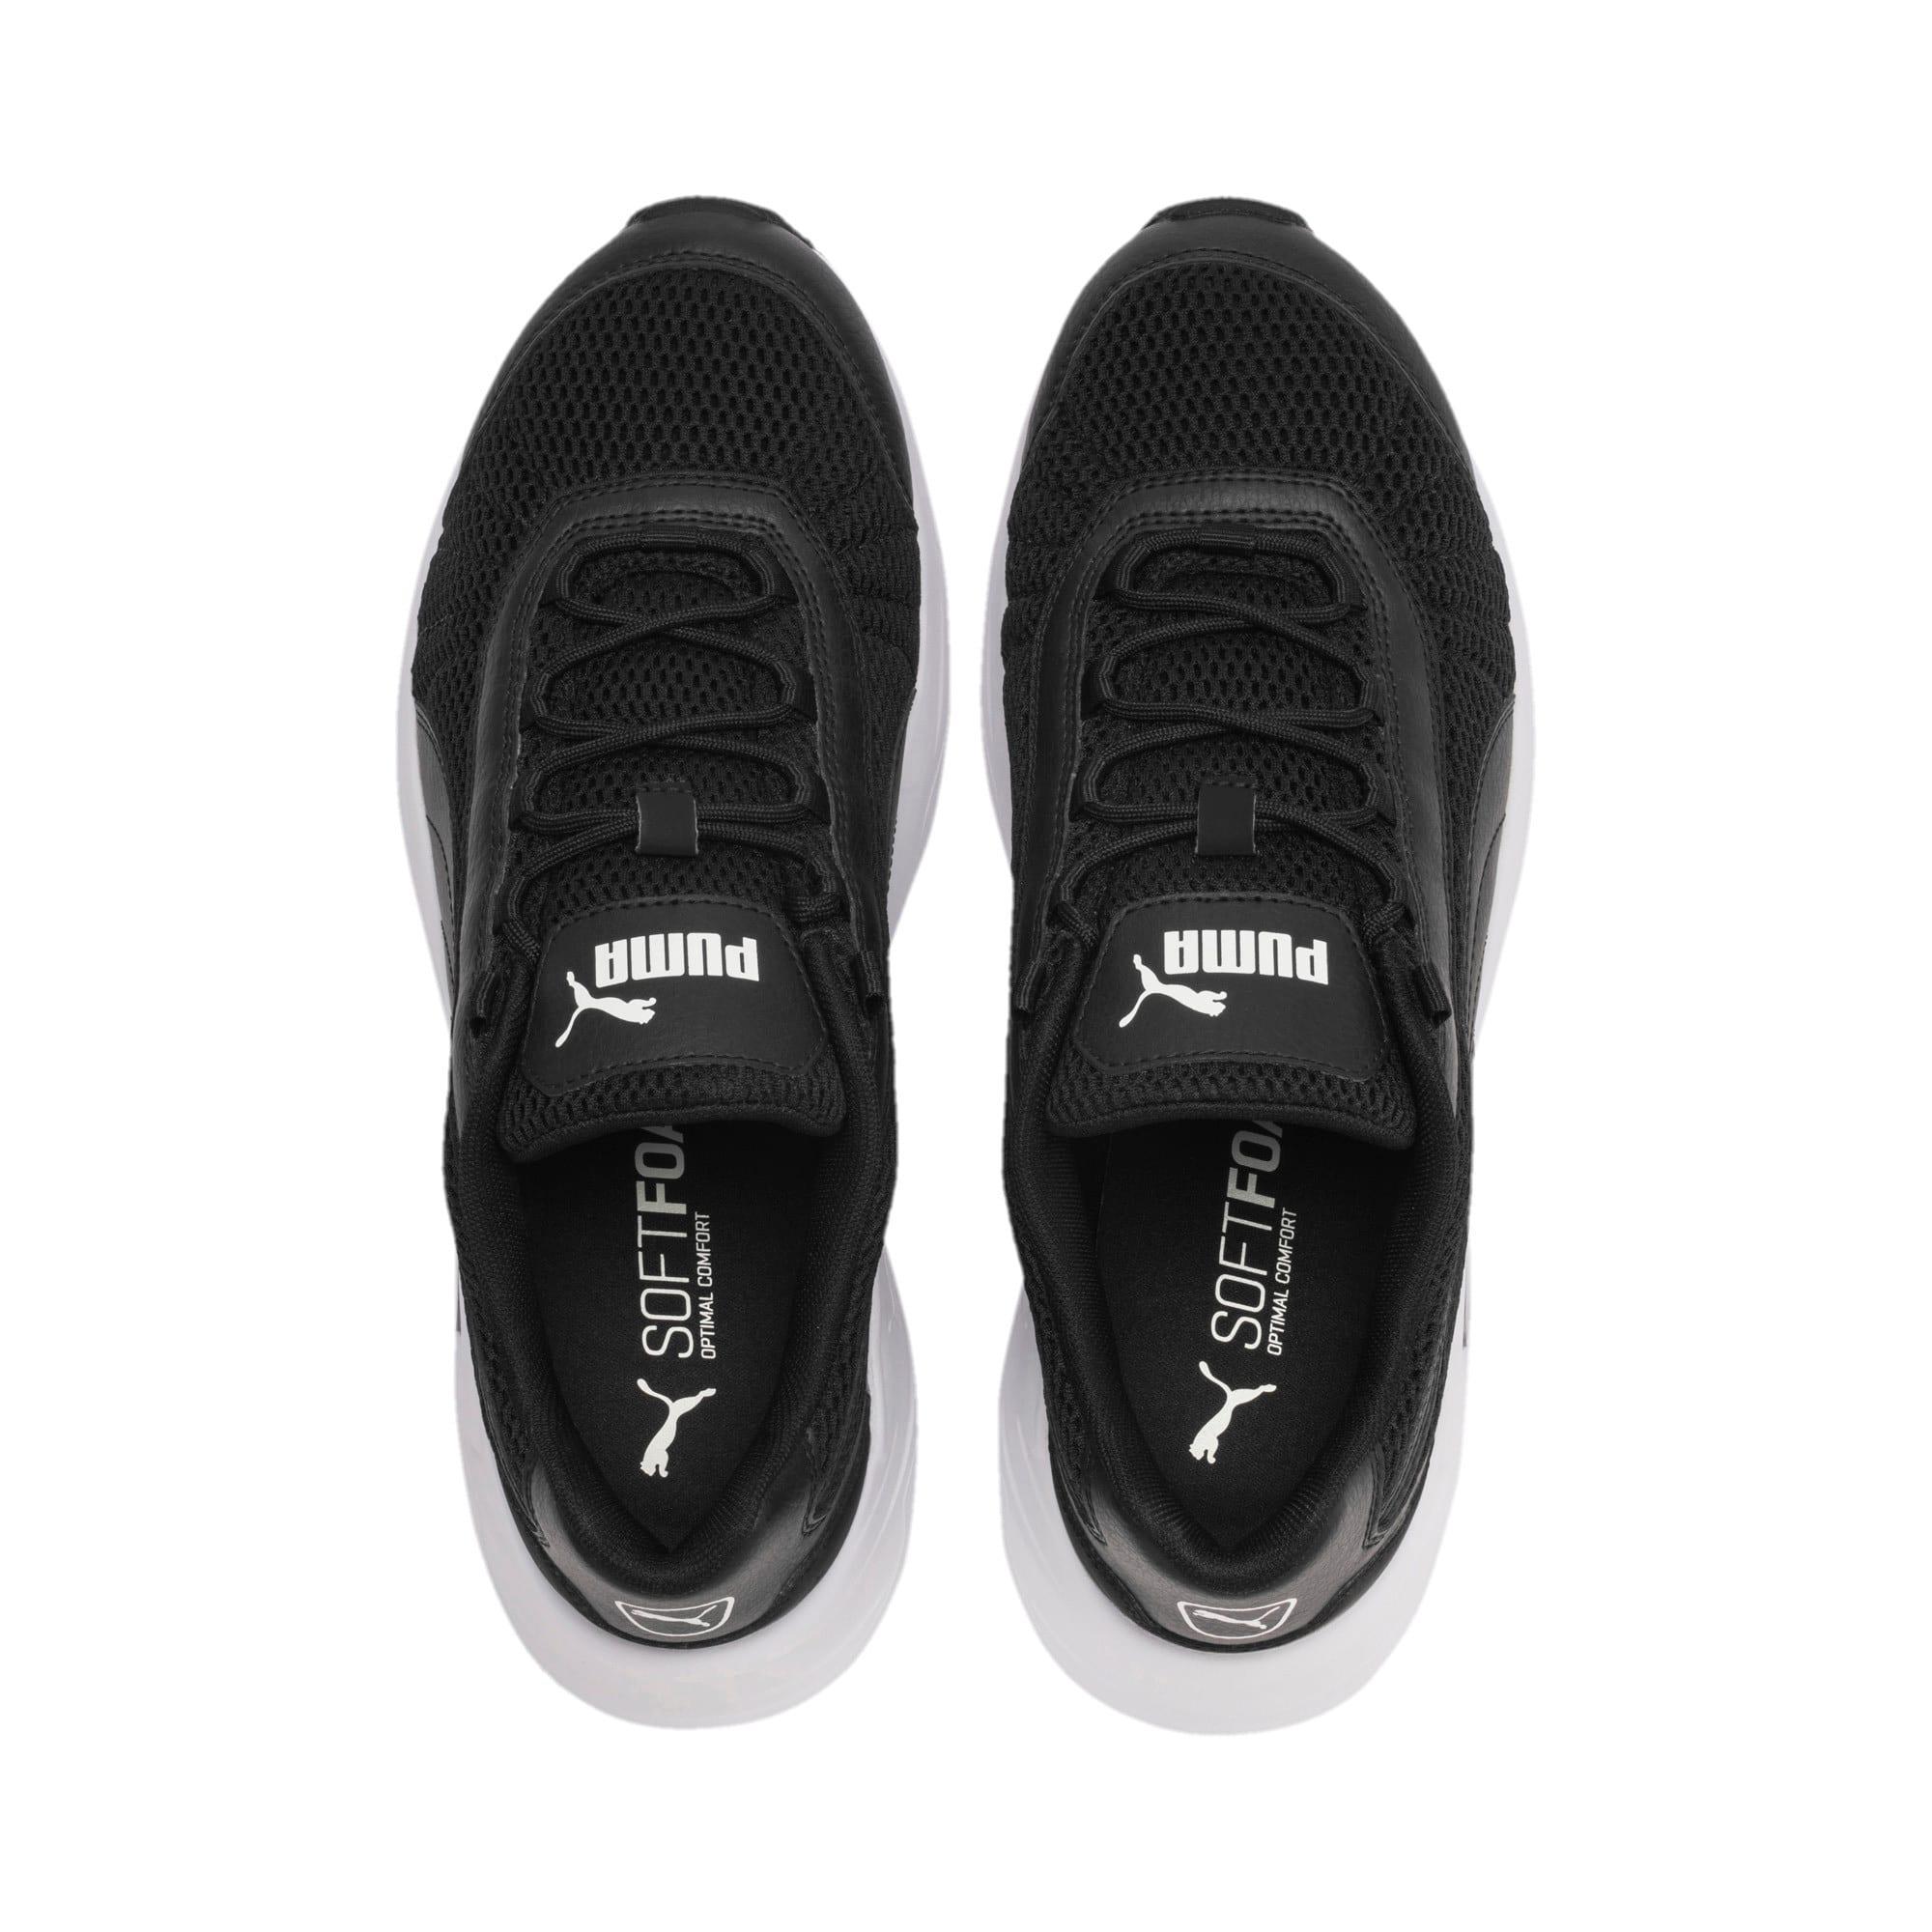 Thumbnail 7 of Nucleus Training Shoes, Puma Black-Puma Black, medium